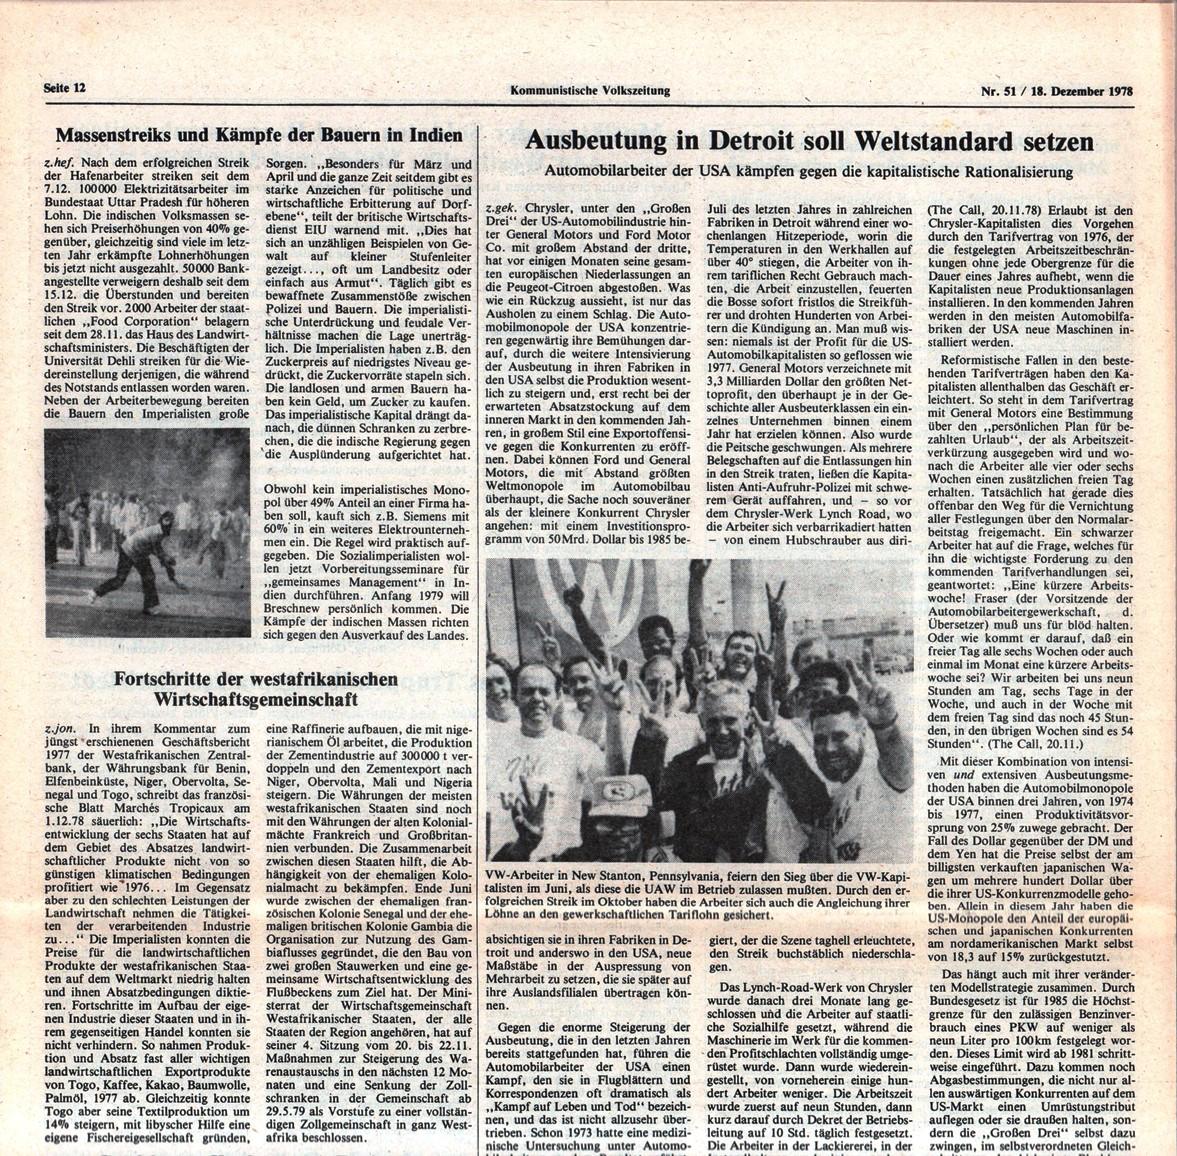 Hamburg_KVZ_1978_51_23